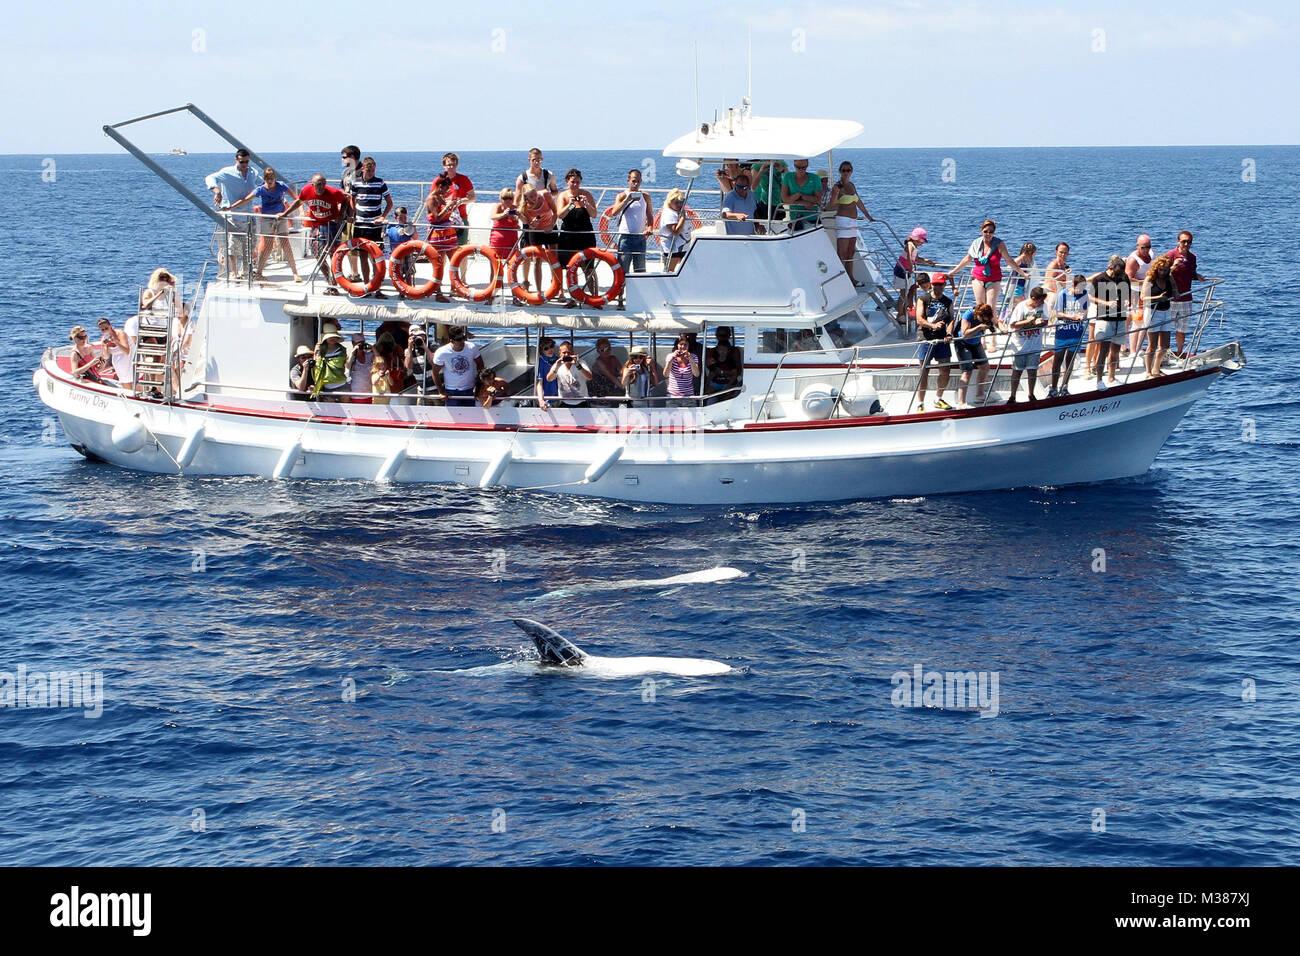 Gran Canaria, Juli 2012, Delphine (Delfine) vor der Kueste, Ausflugsboot - Stock Image